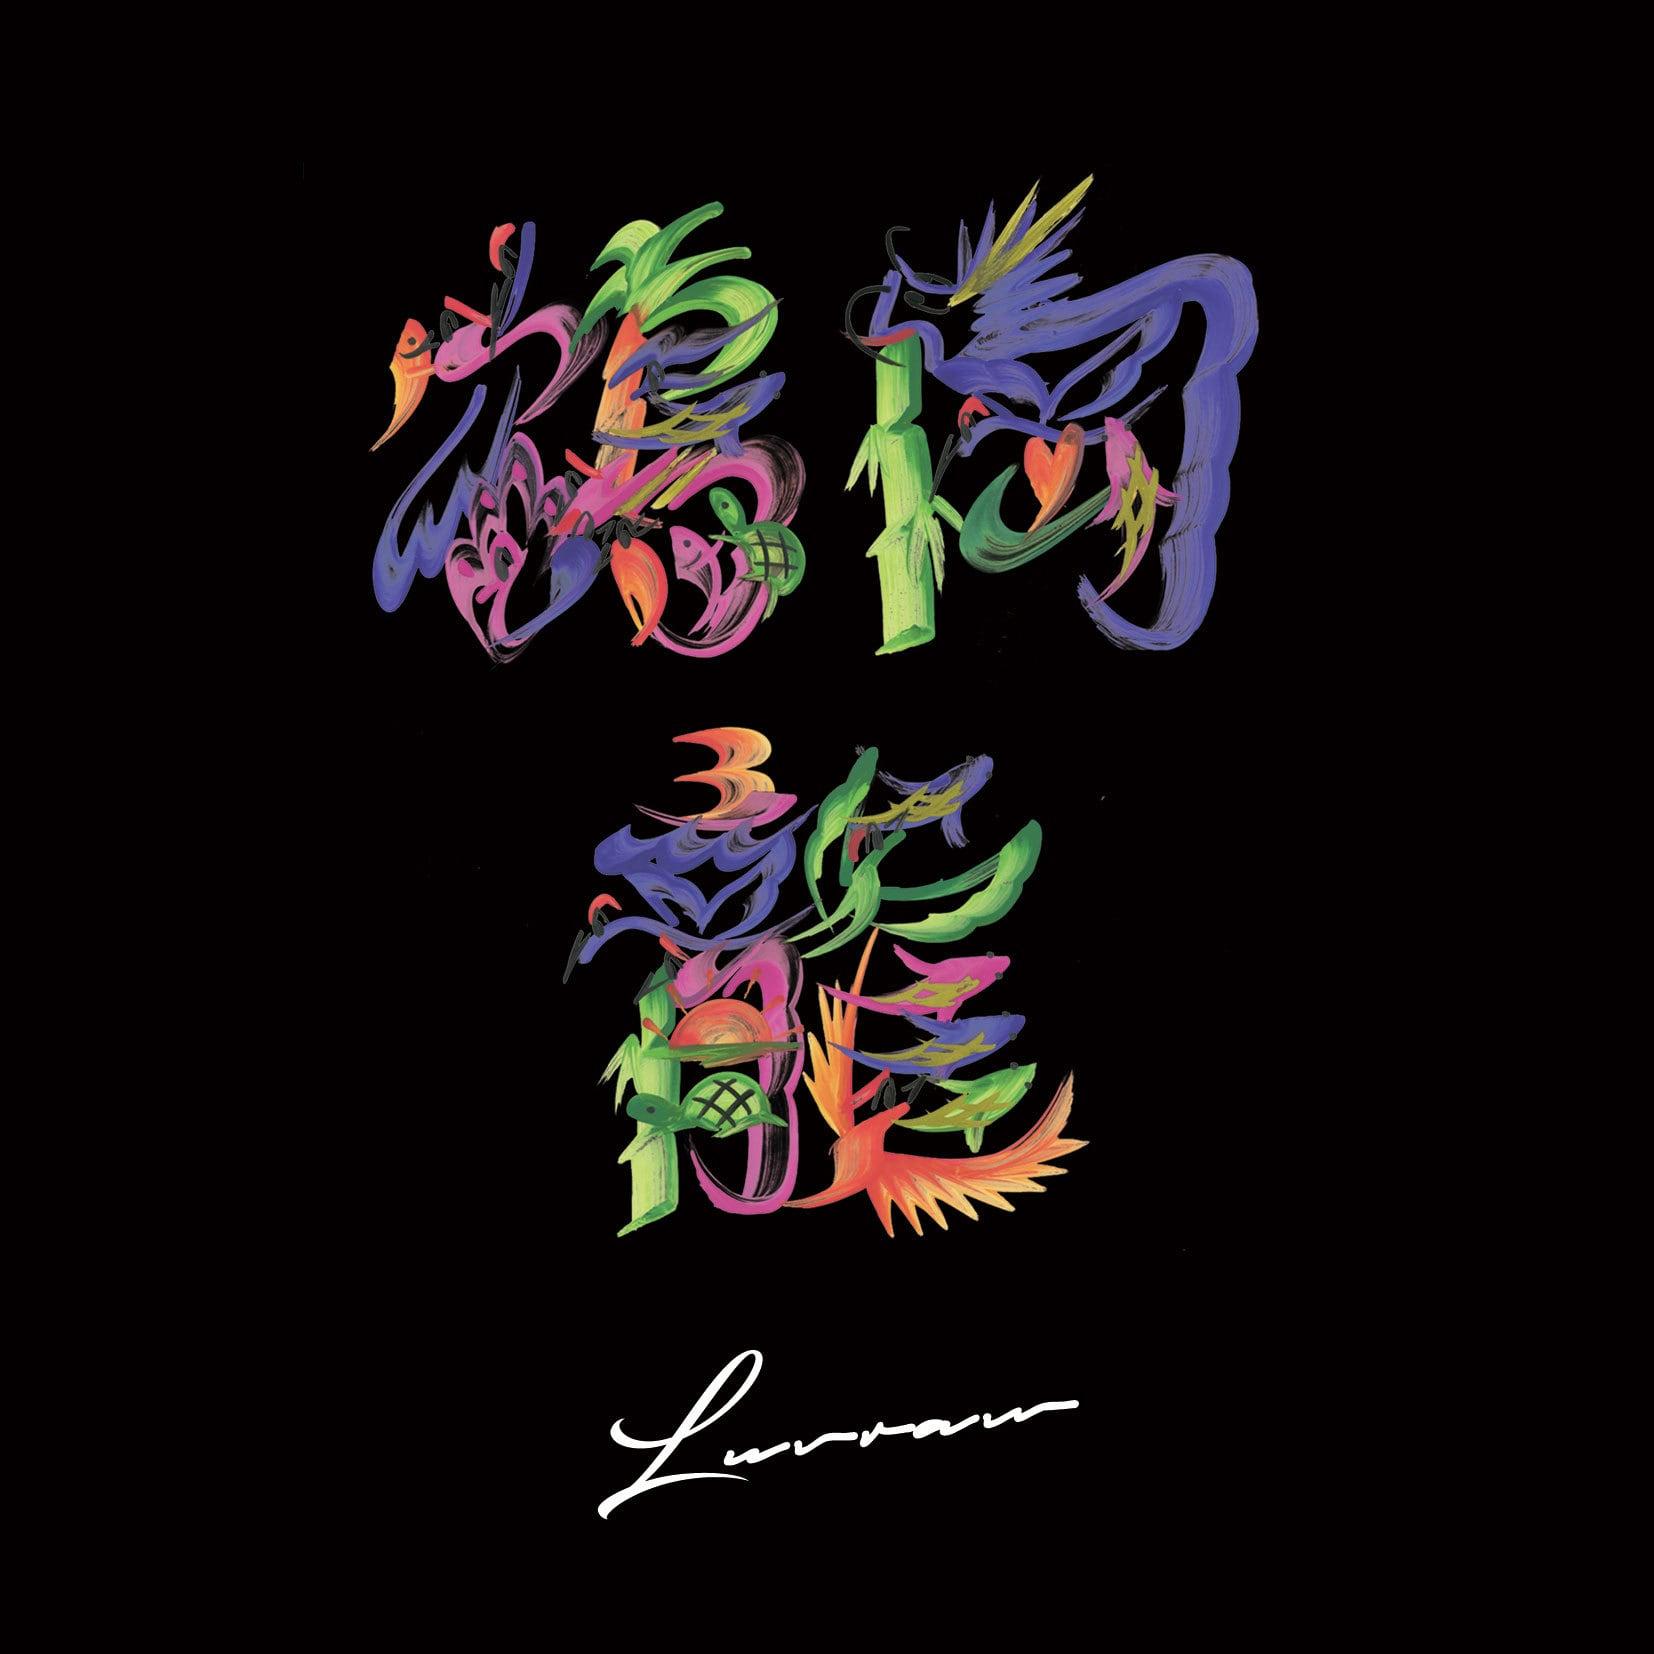 【CD ALBUM】鶴岡龍とマグネティックス - LUVRAW